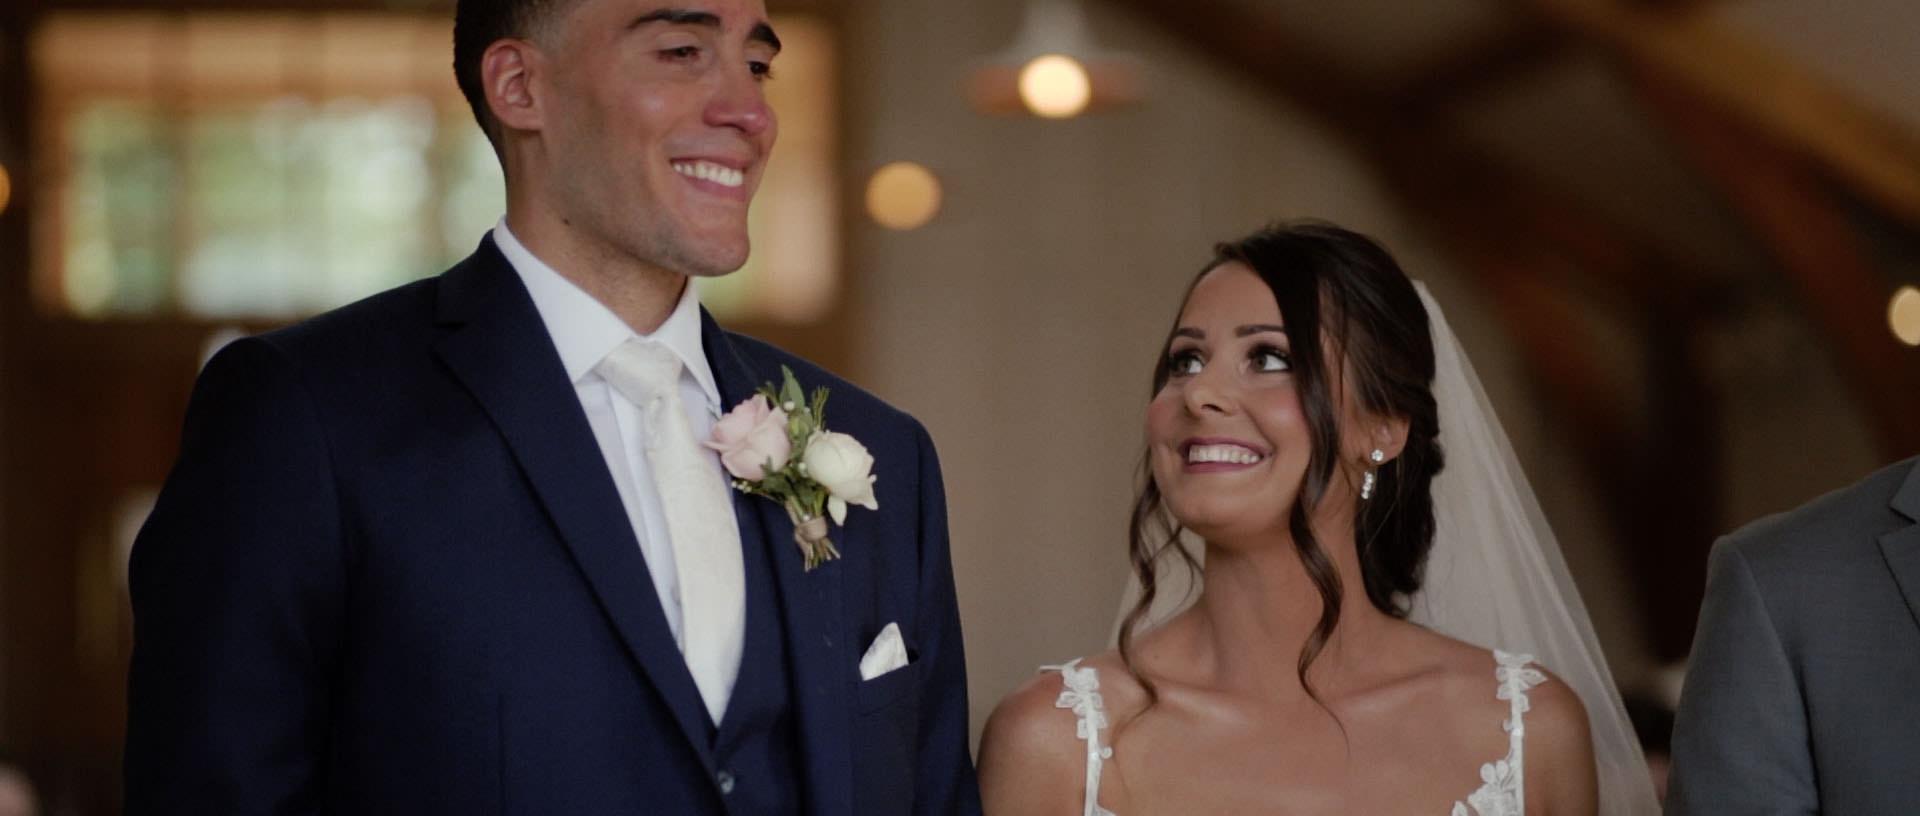 Hyde Barn Colswolds Wedding Verity-Jade & Kai 20 Cropped.jpg